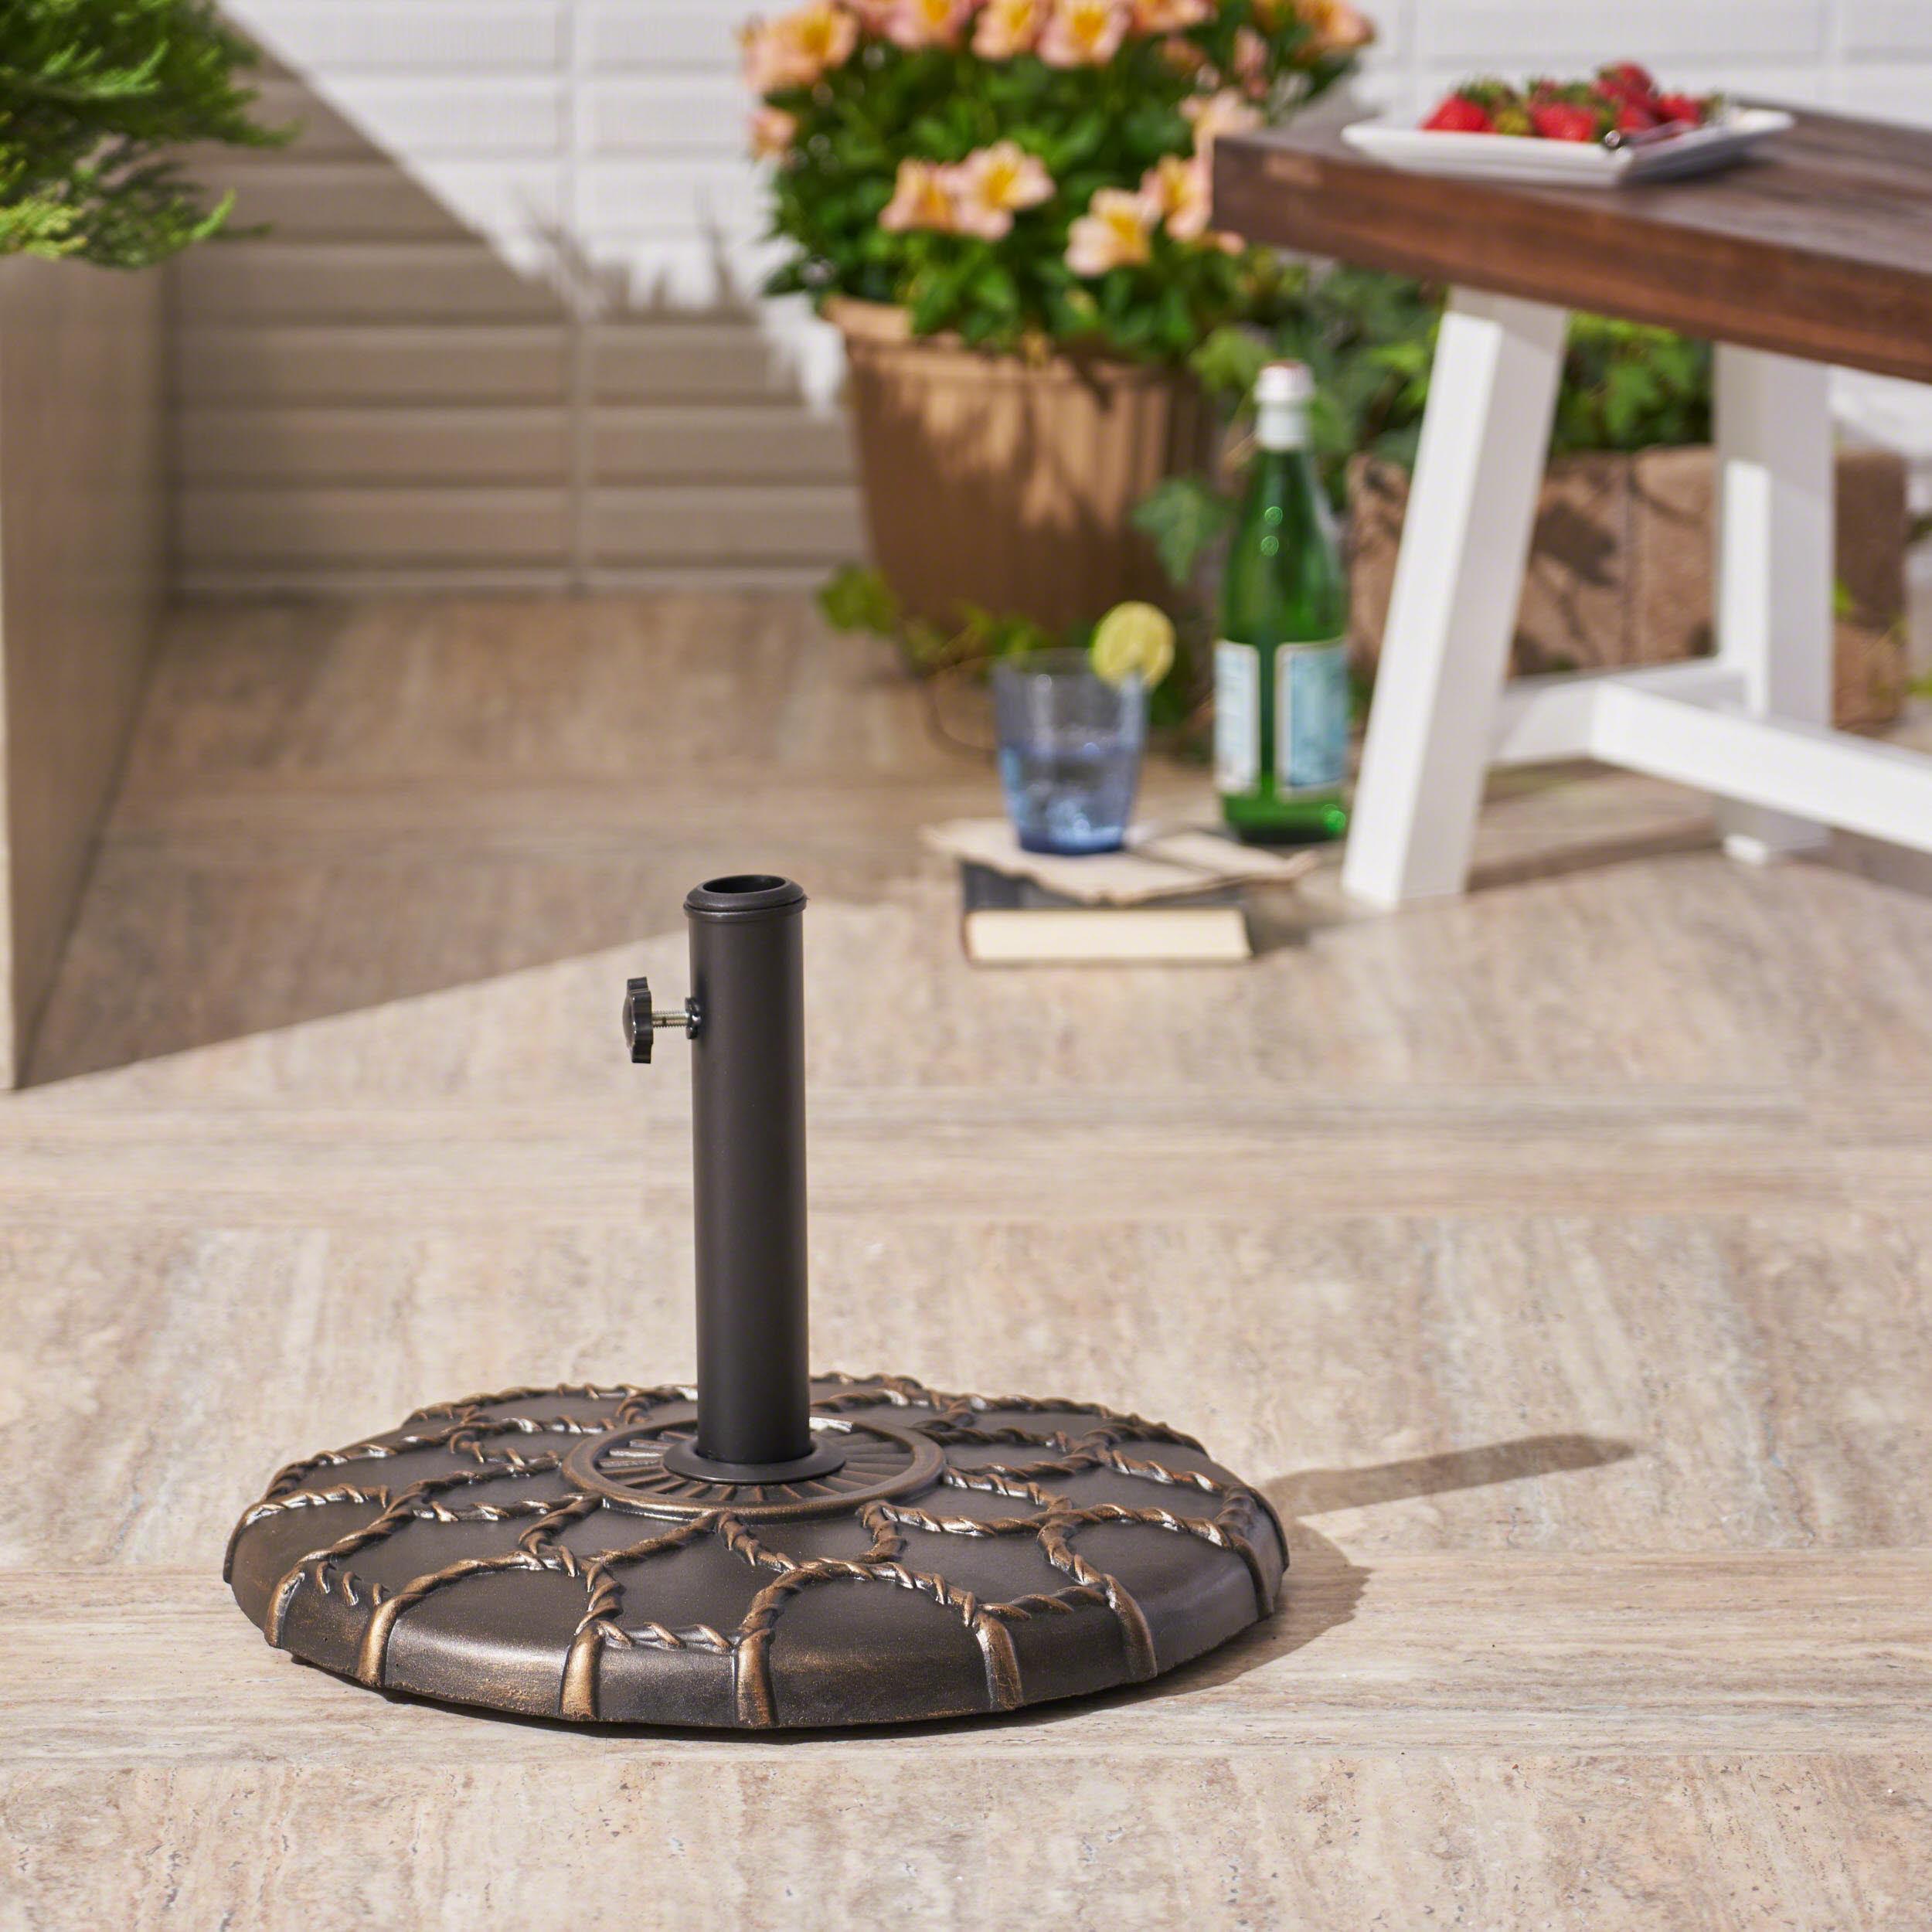 Outdoor 37lb Concrete Circular Umbrella Base, Hammered Dark Copper